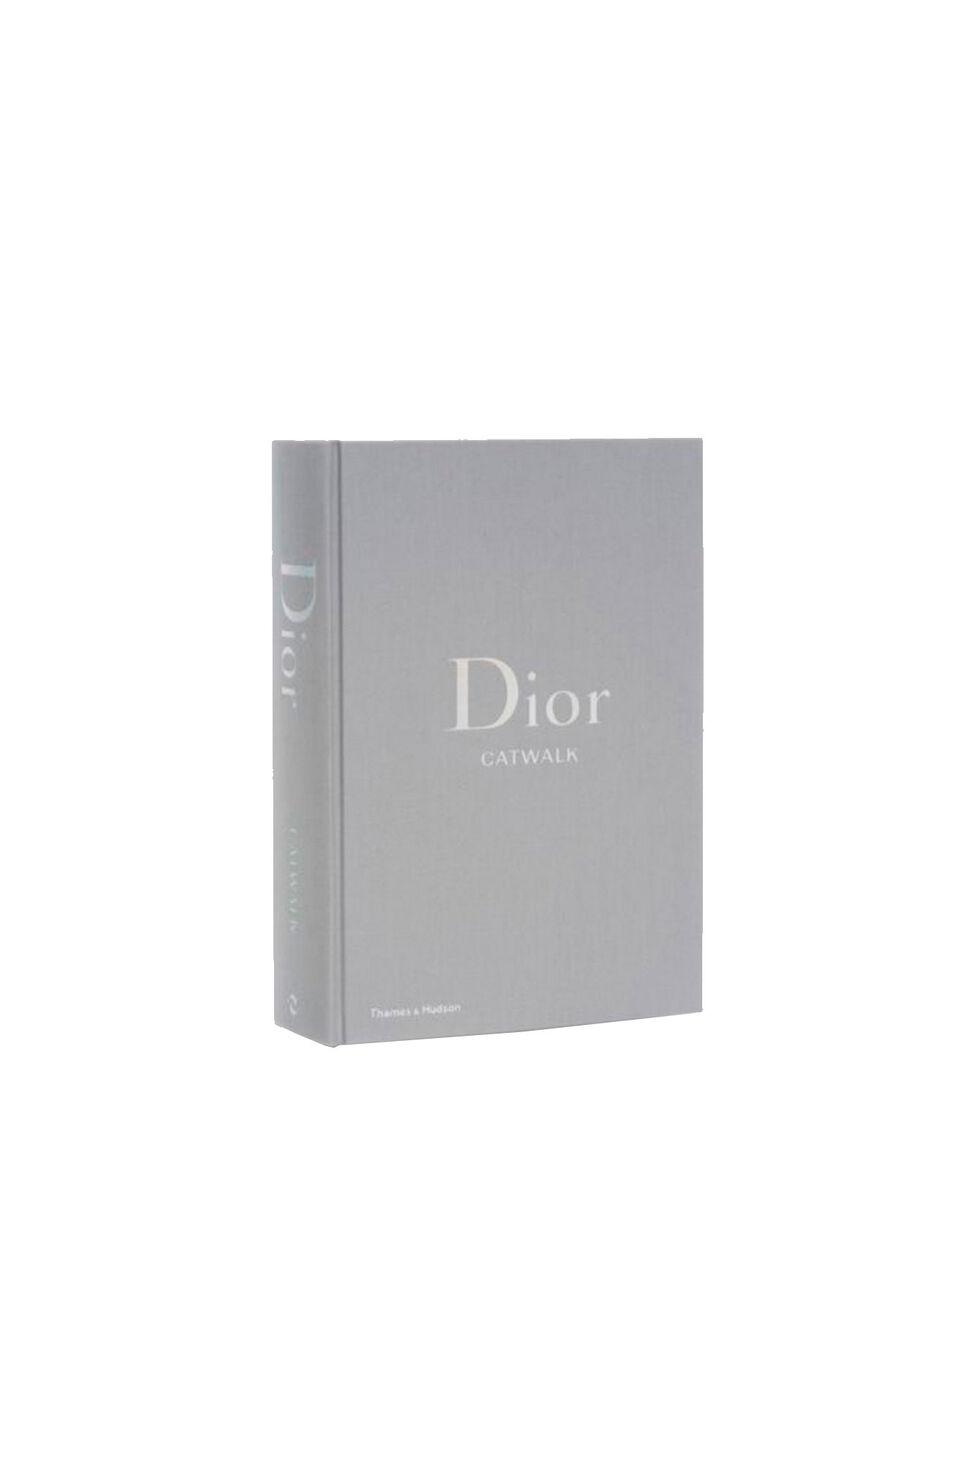 Dior catwalk TH1011, MULTIPLE